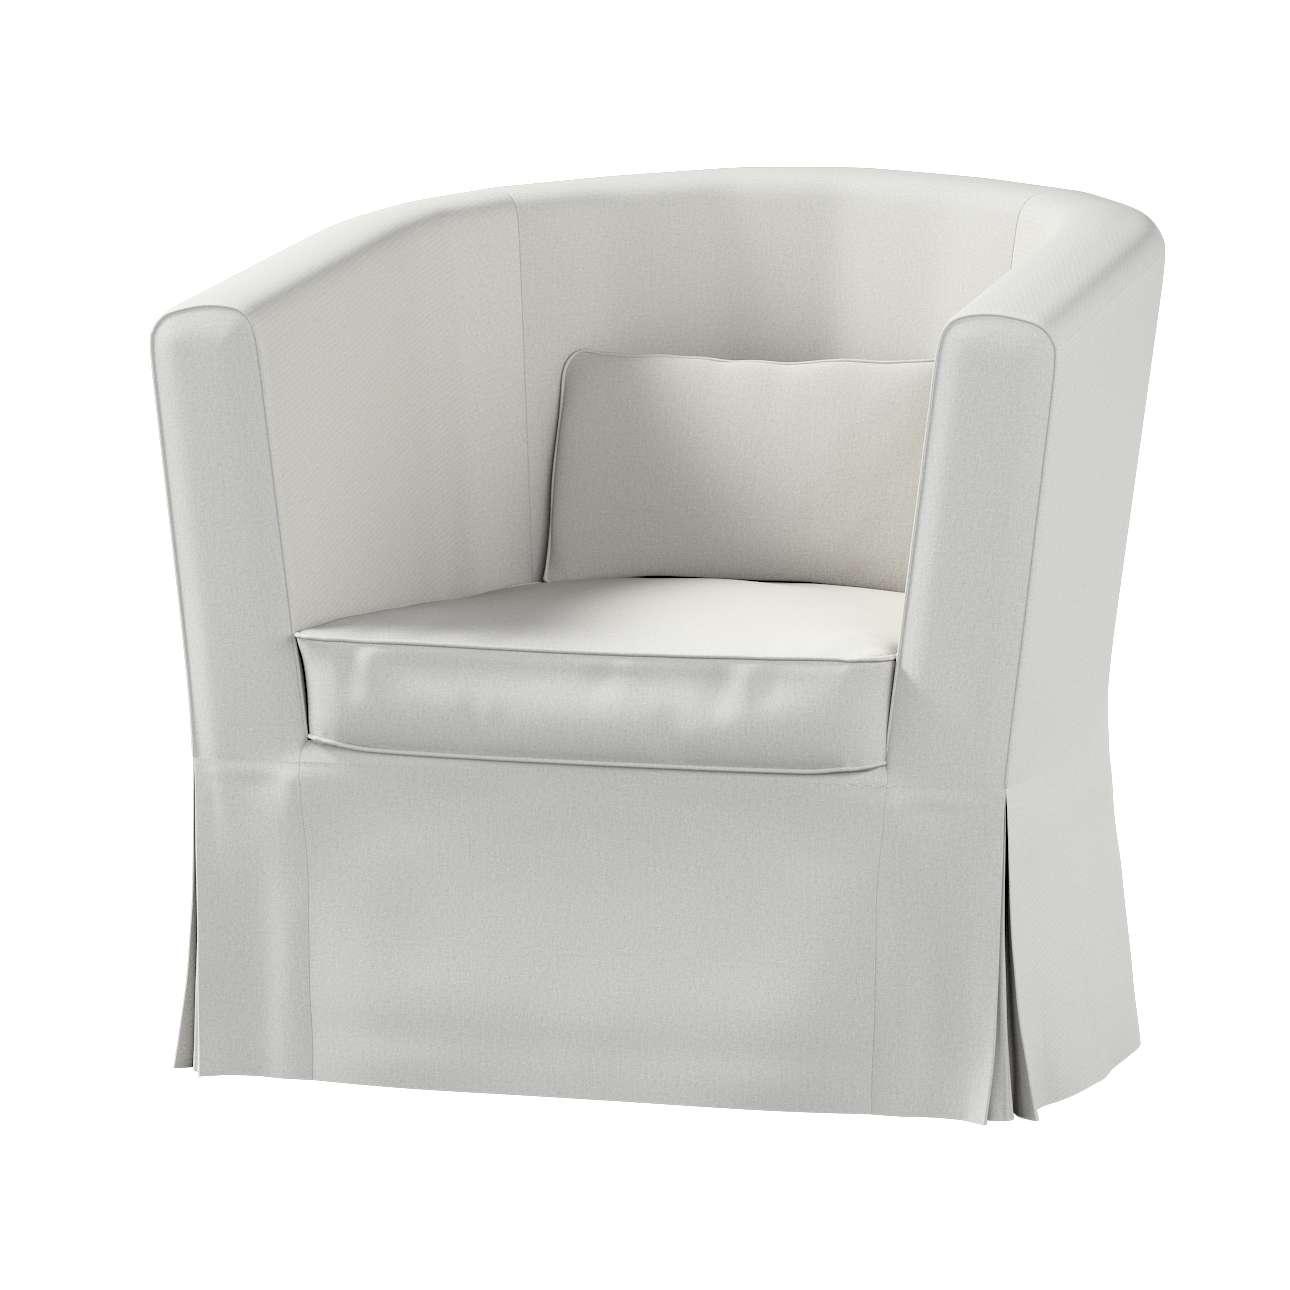 Ektorp Tullsta Sesselbezug Sesselhusse, Ektorp Tullsta von der Kollektion Etna, Stoff: 705-90